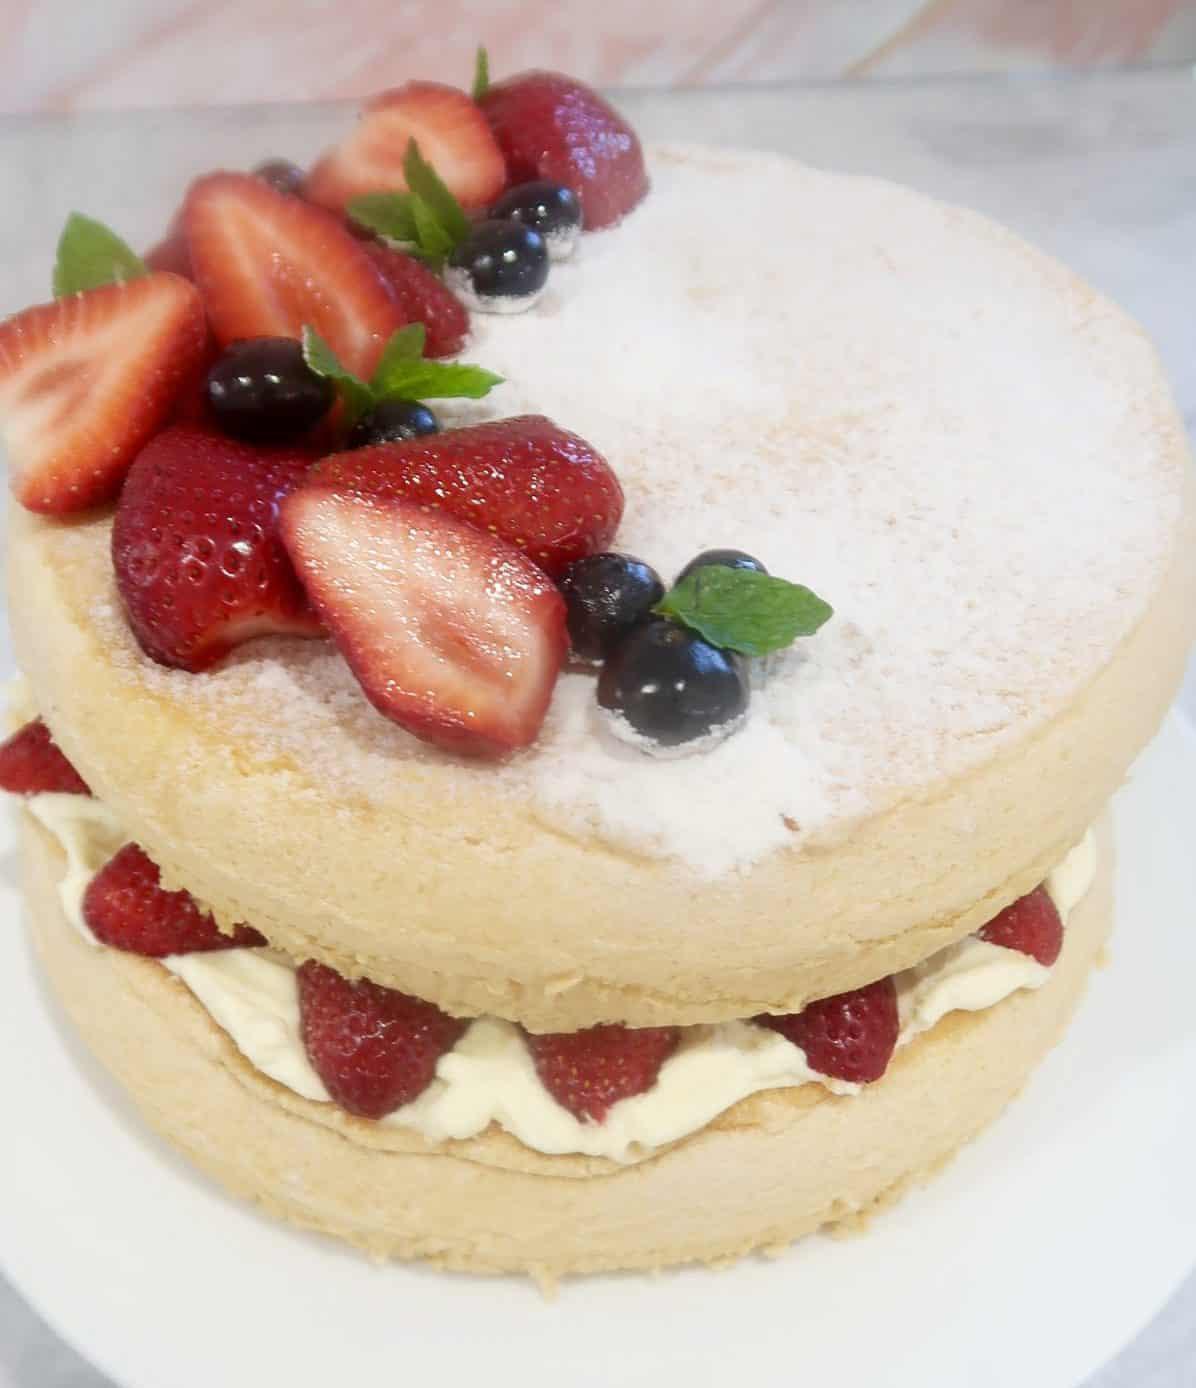 vanilla sponge cake with strawberries and cream